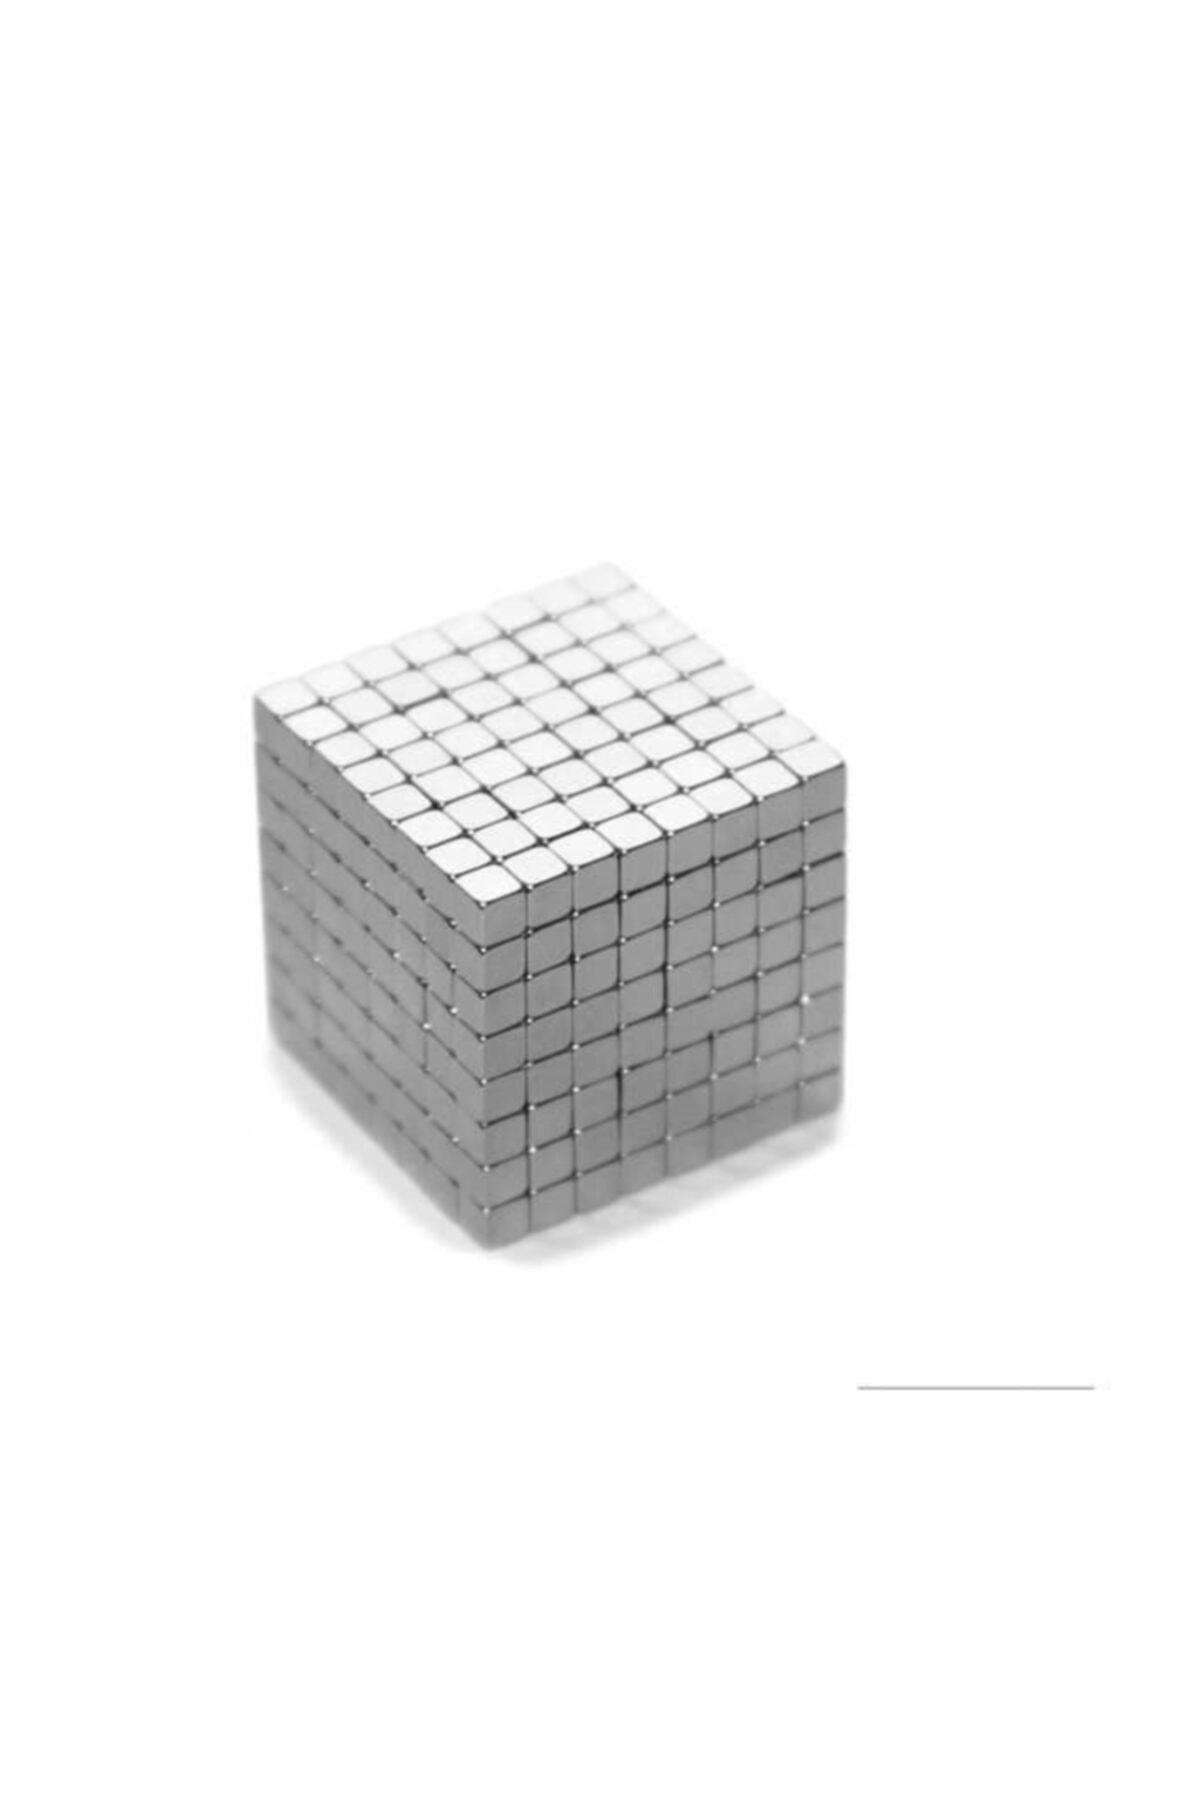 Dünya Magnet 100 Adet 3mm x 3mm X 3mm Küp Neodyum Mıknatıs - Çok Güçlü Mıknatıs 1